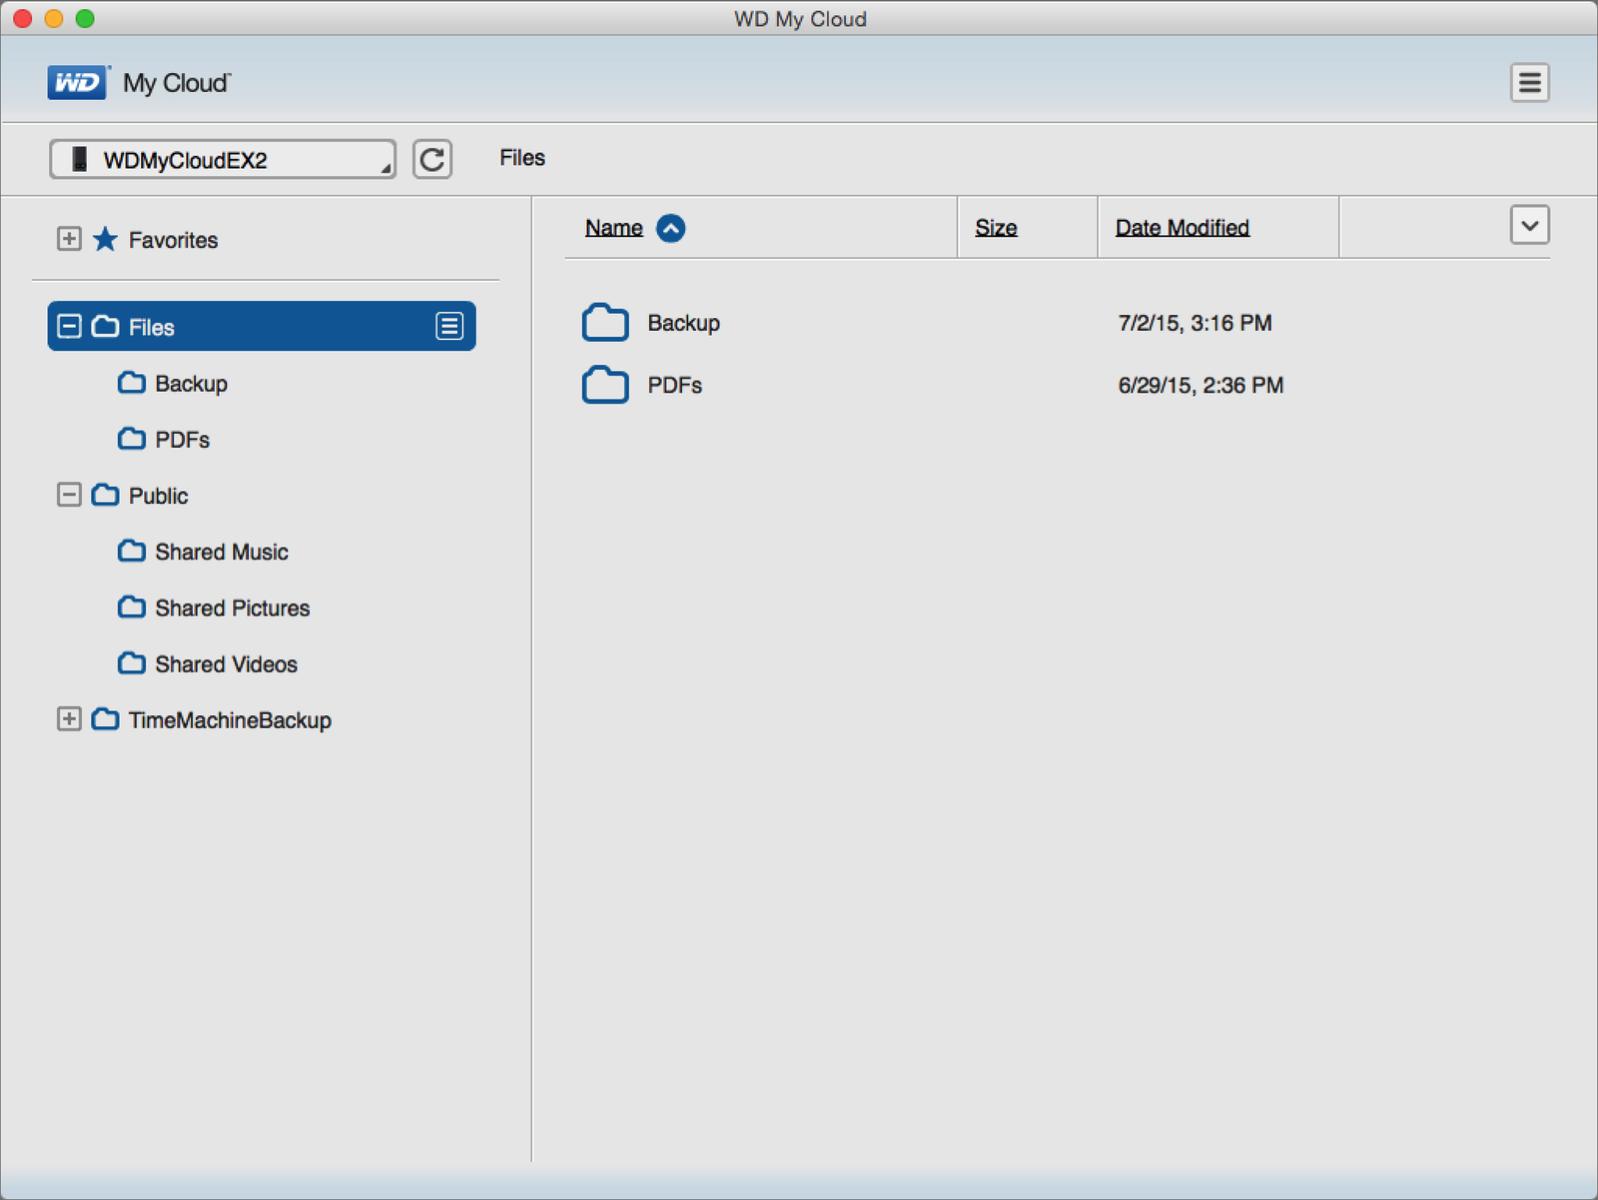 Kirkville - Review: WD MyCloud EX2 Network Storage Device